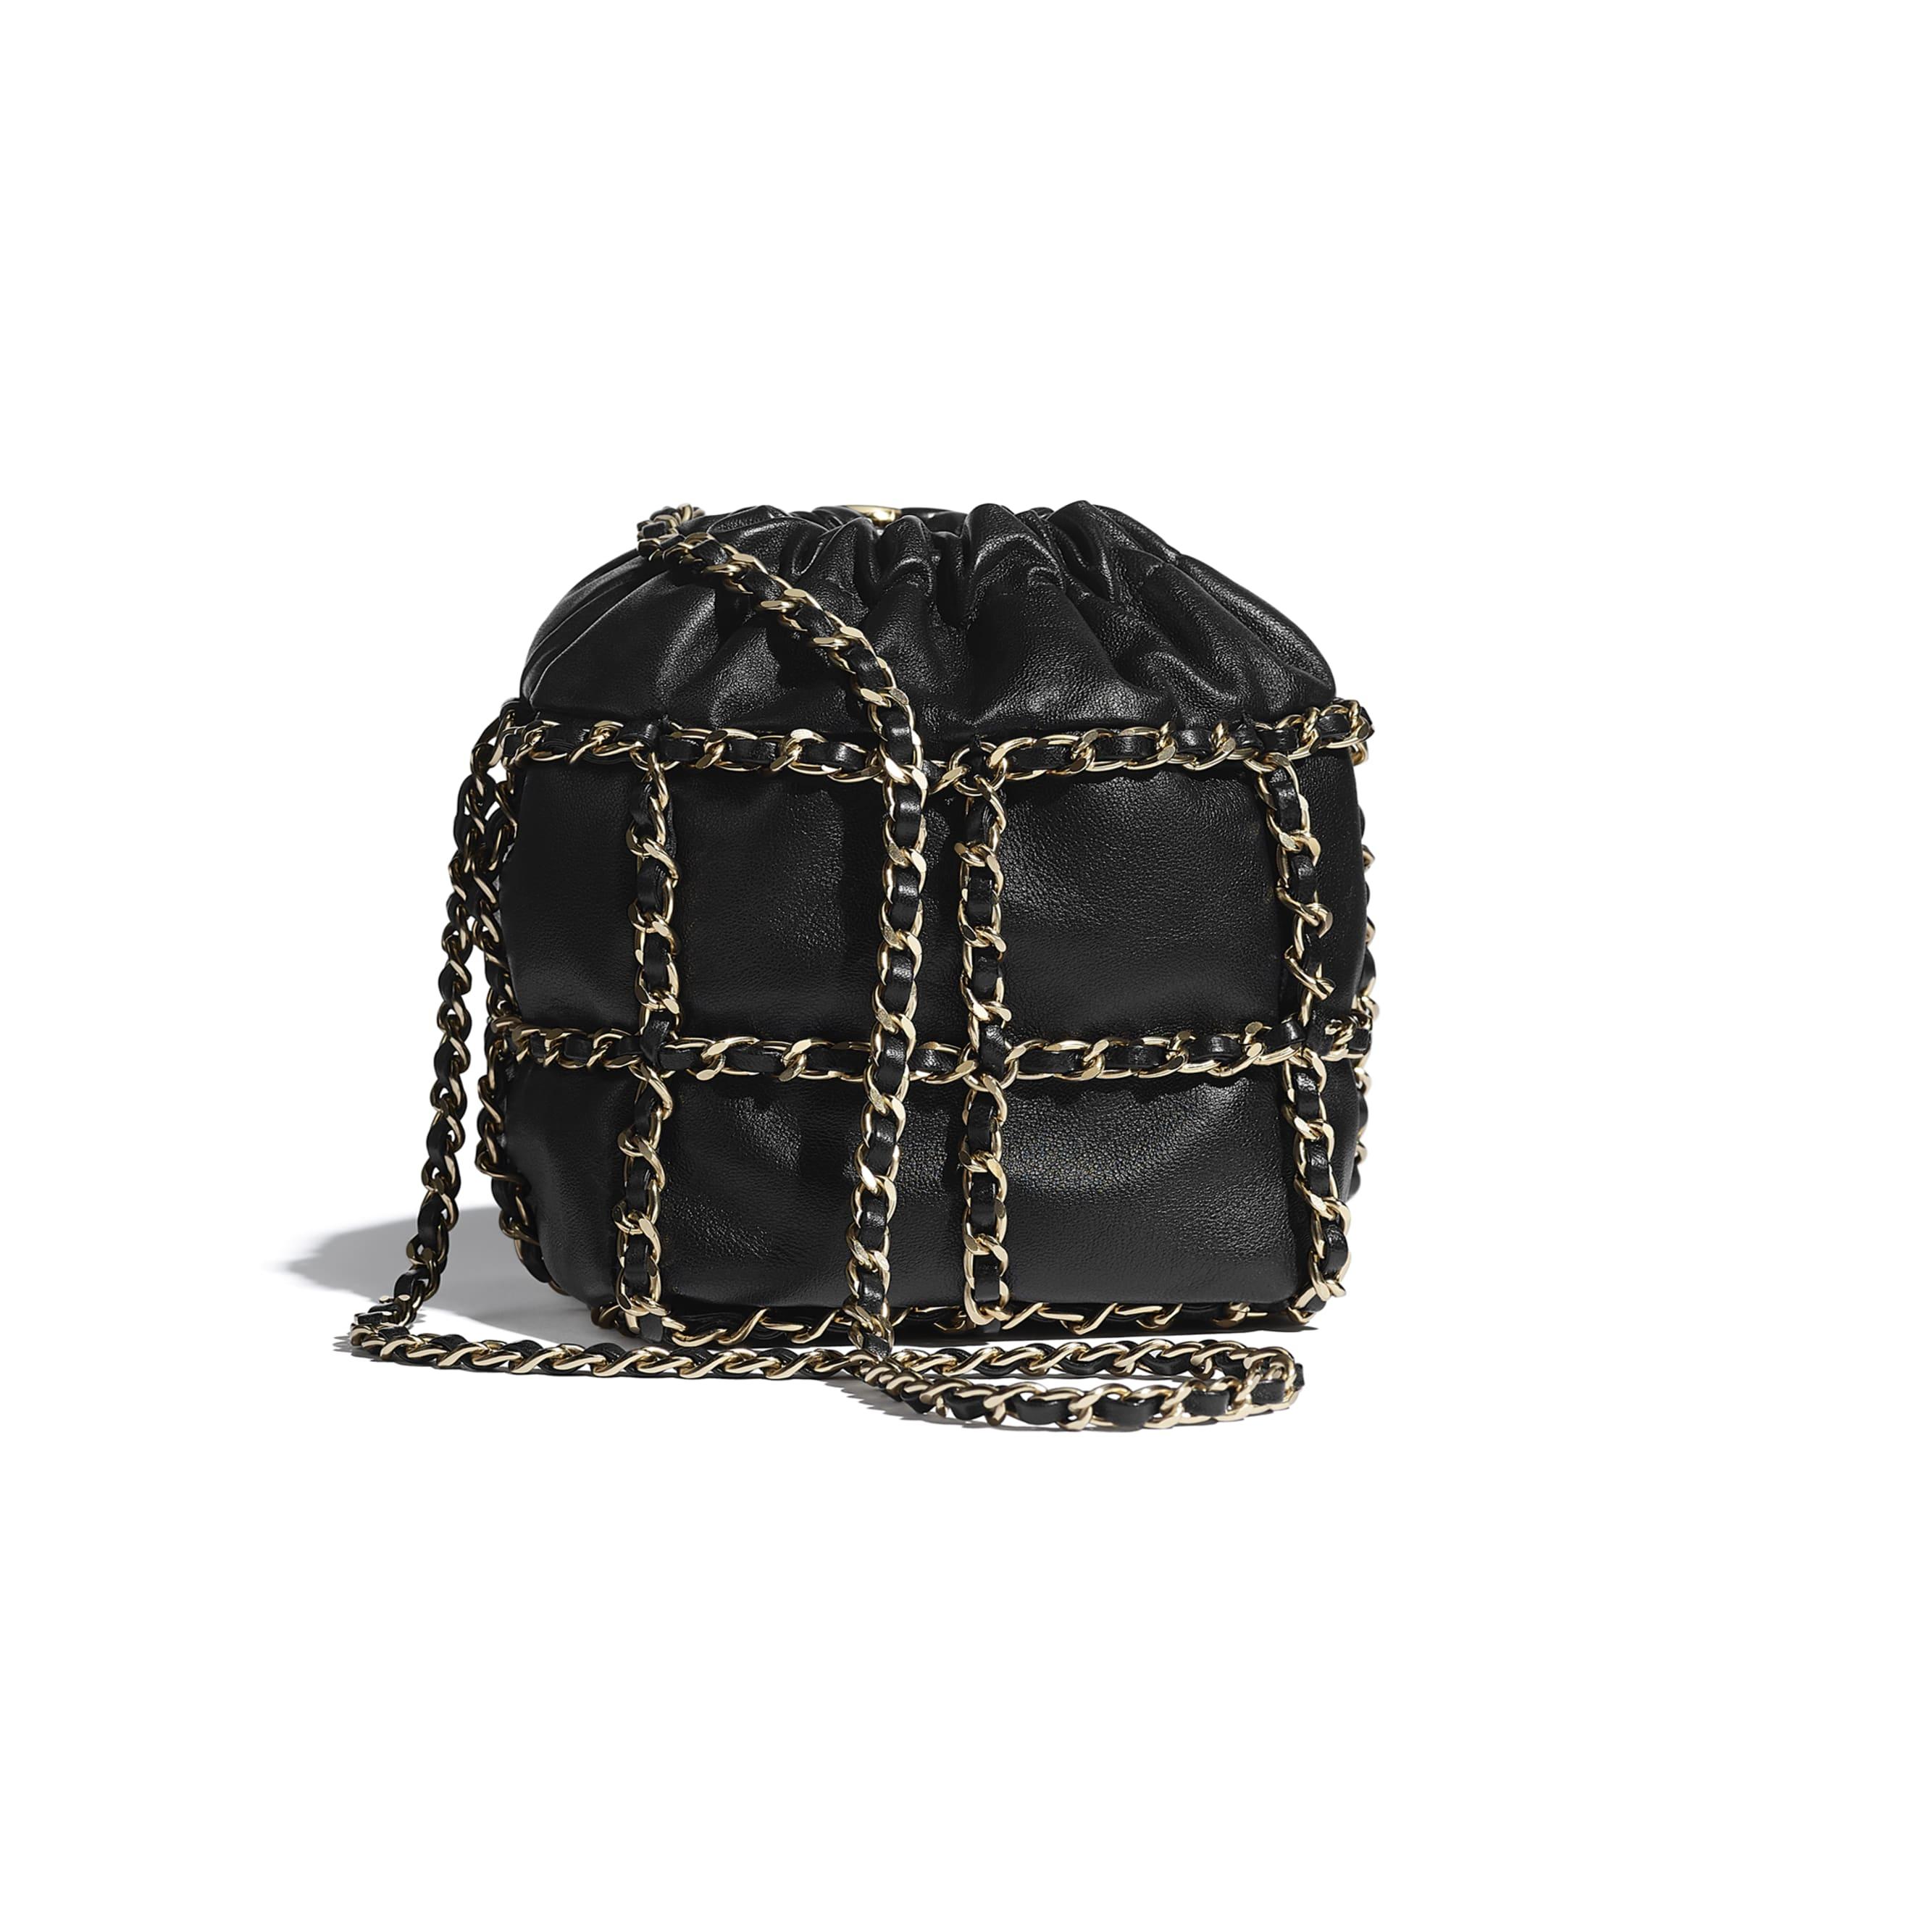 Small Drawstring Bag - Black - Lambskin & Gold Metal  - CHANEL - Alternative view - see standard sized version